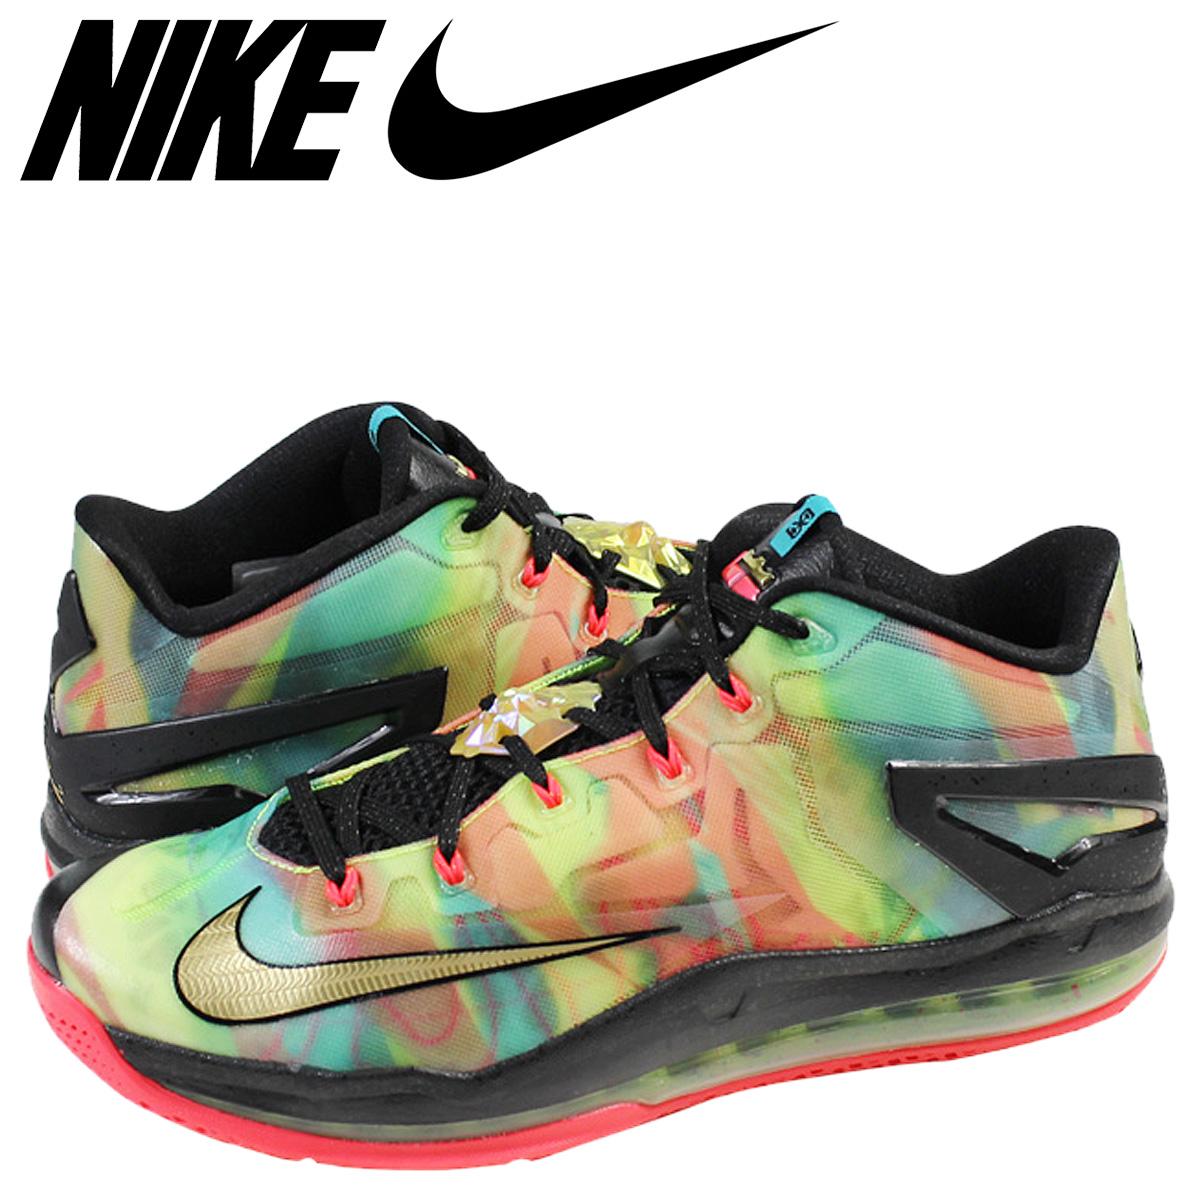 huge discount 5781a 0d202 Nike NIKE LeBron sneakers LEBRON 11 LOW SE CHANPIONSHIP PACK LeBron 11 Lo  SE Championship 695224-970 men's multi